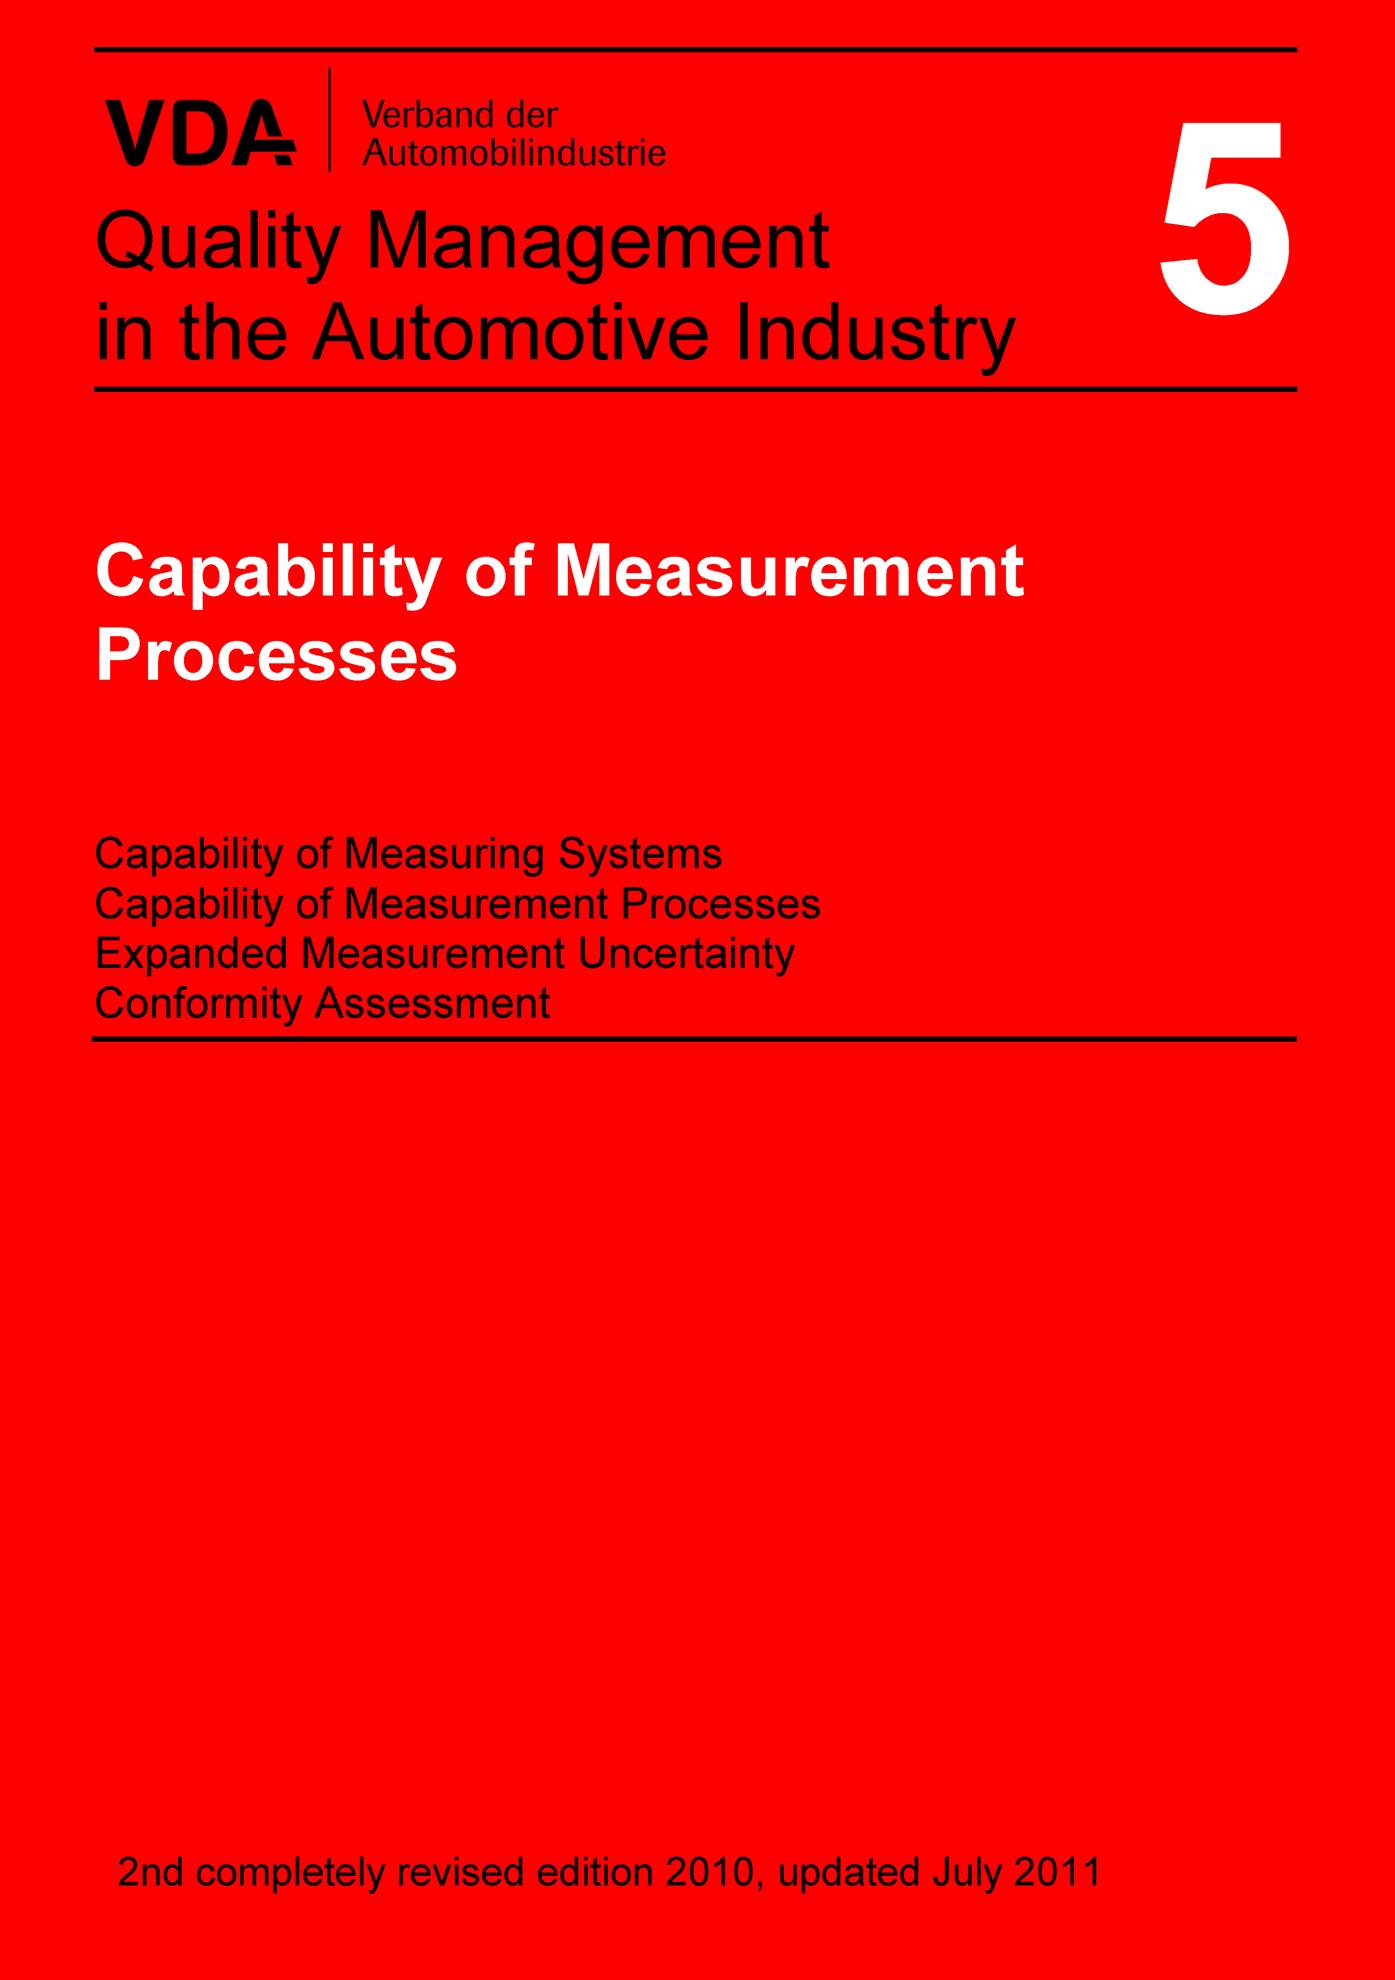 volume 5 verband der automobilindustrie e v qualit ts management rh webshop vda de VDA 6.3 Training VDA 6.3 Training